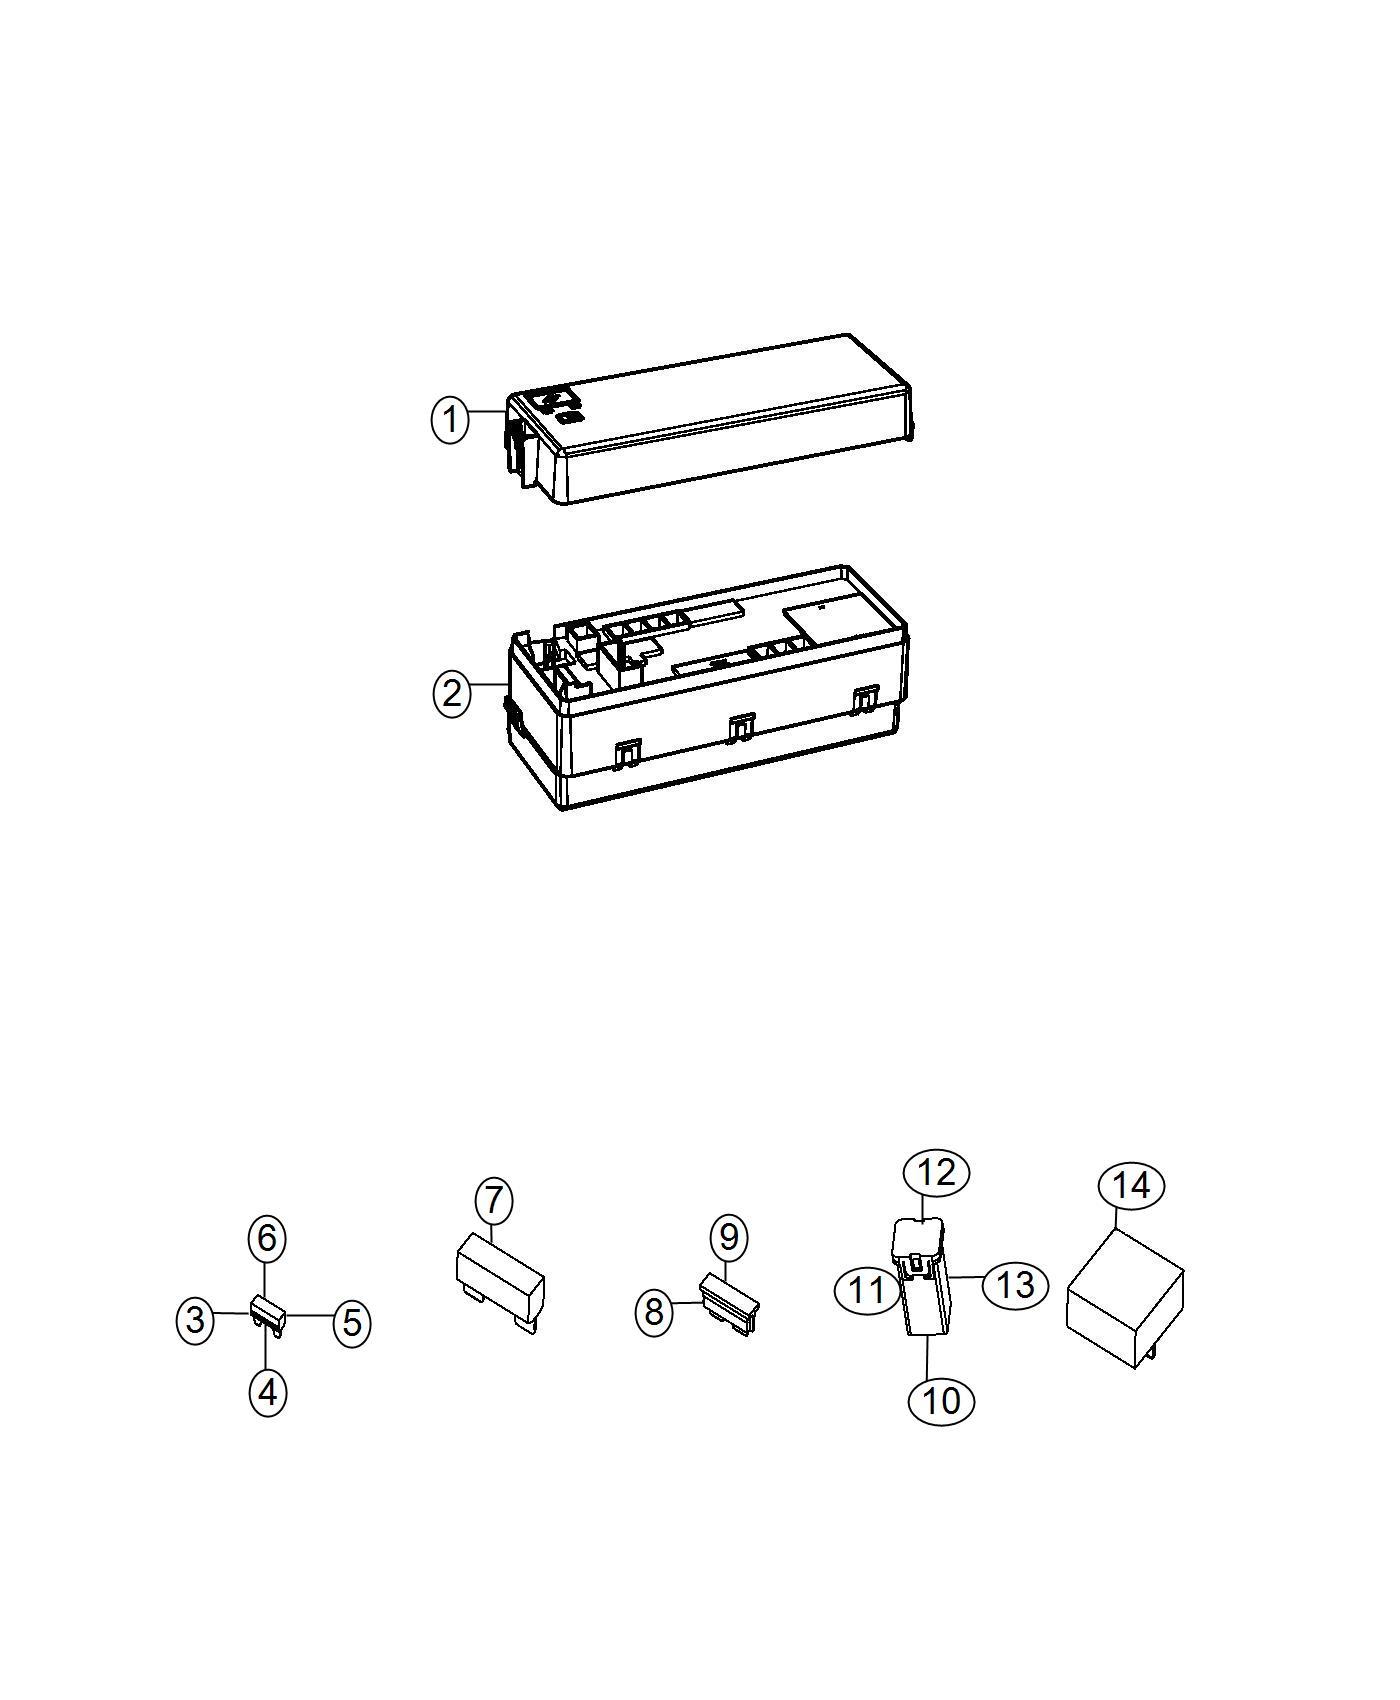 Dodge Charger Fuse, fuse cartridge. J case. 20 amp. Export